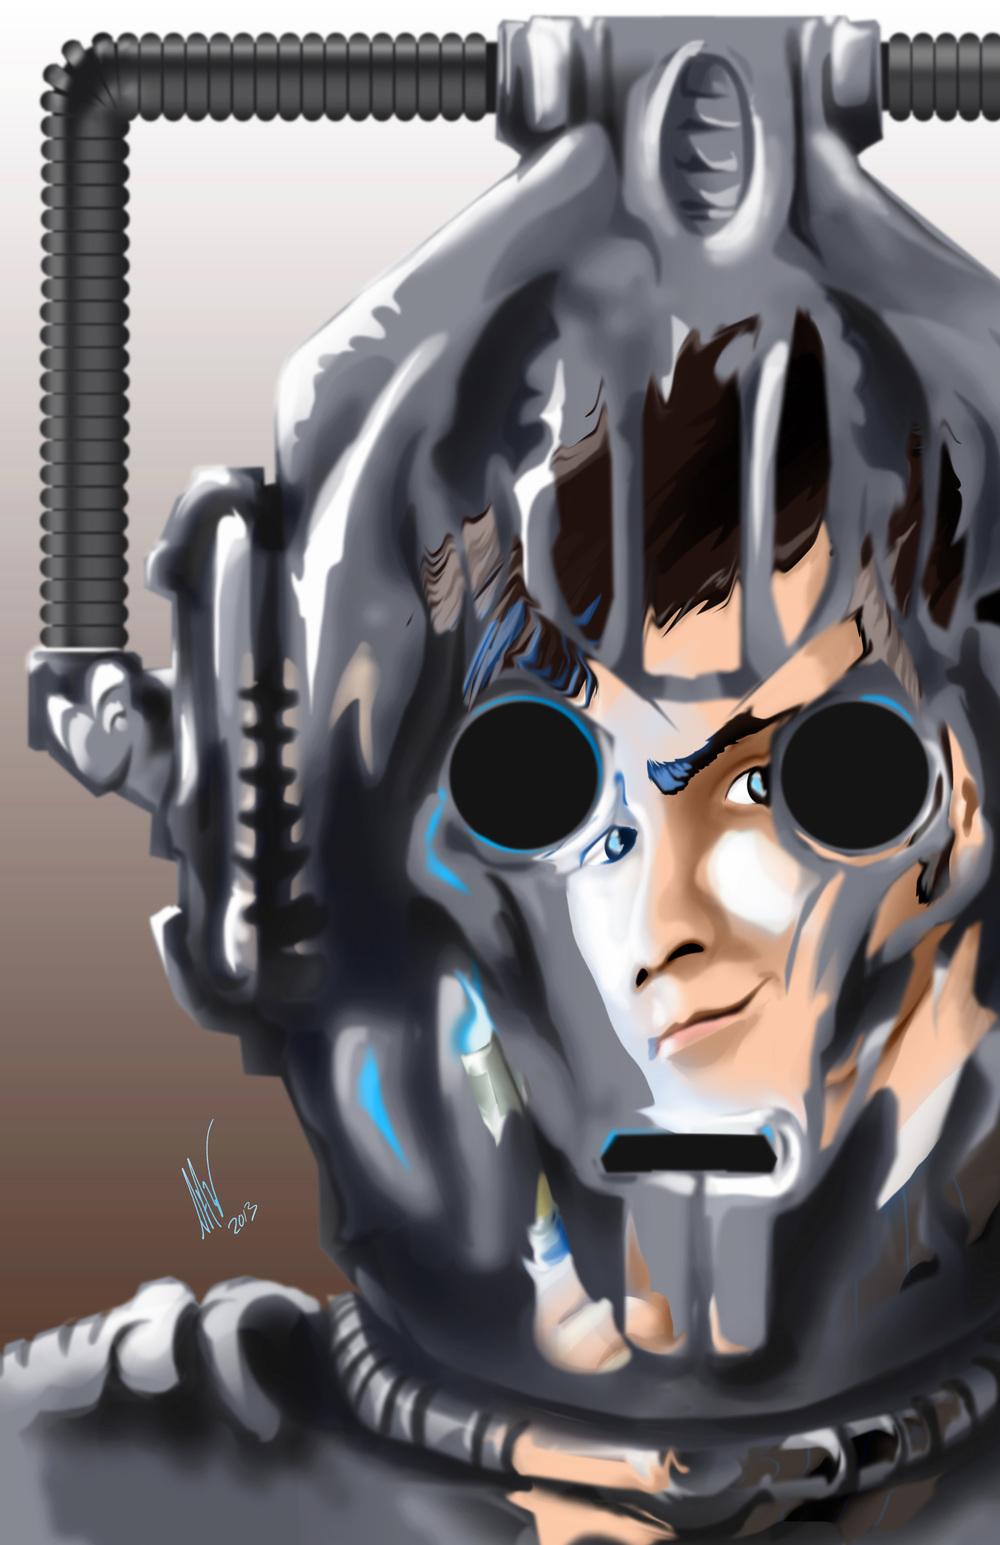 Dr Who-Cyberwho 11x17.jpg